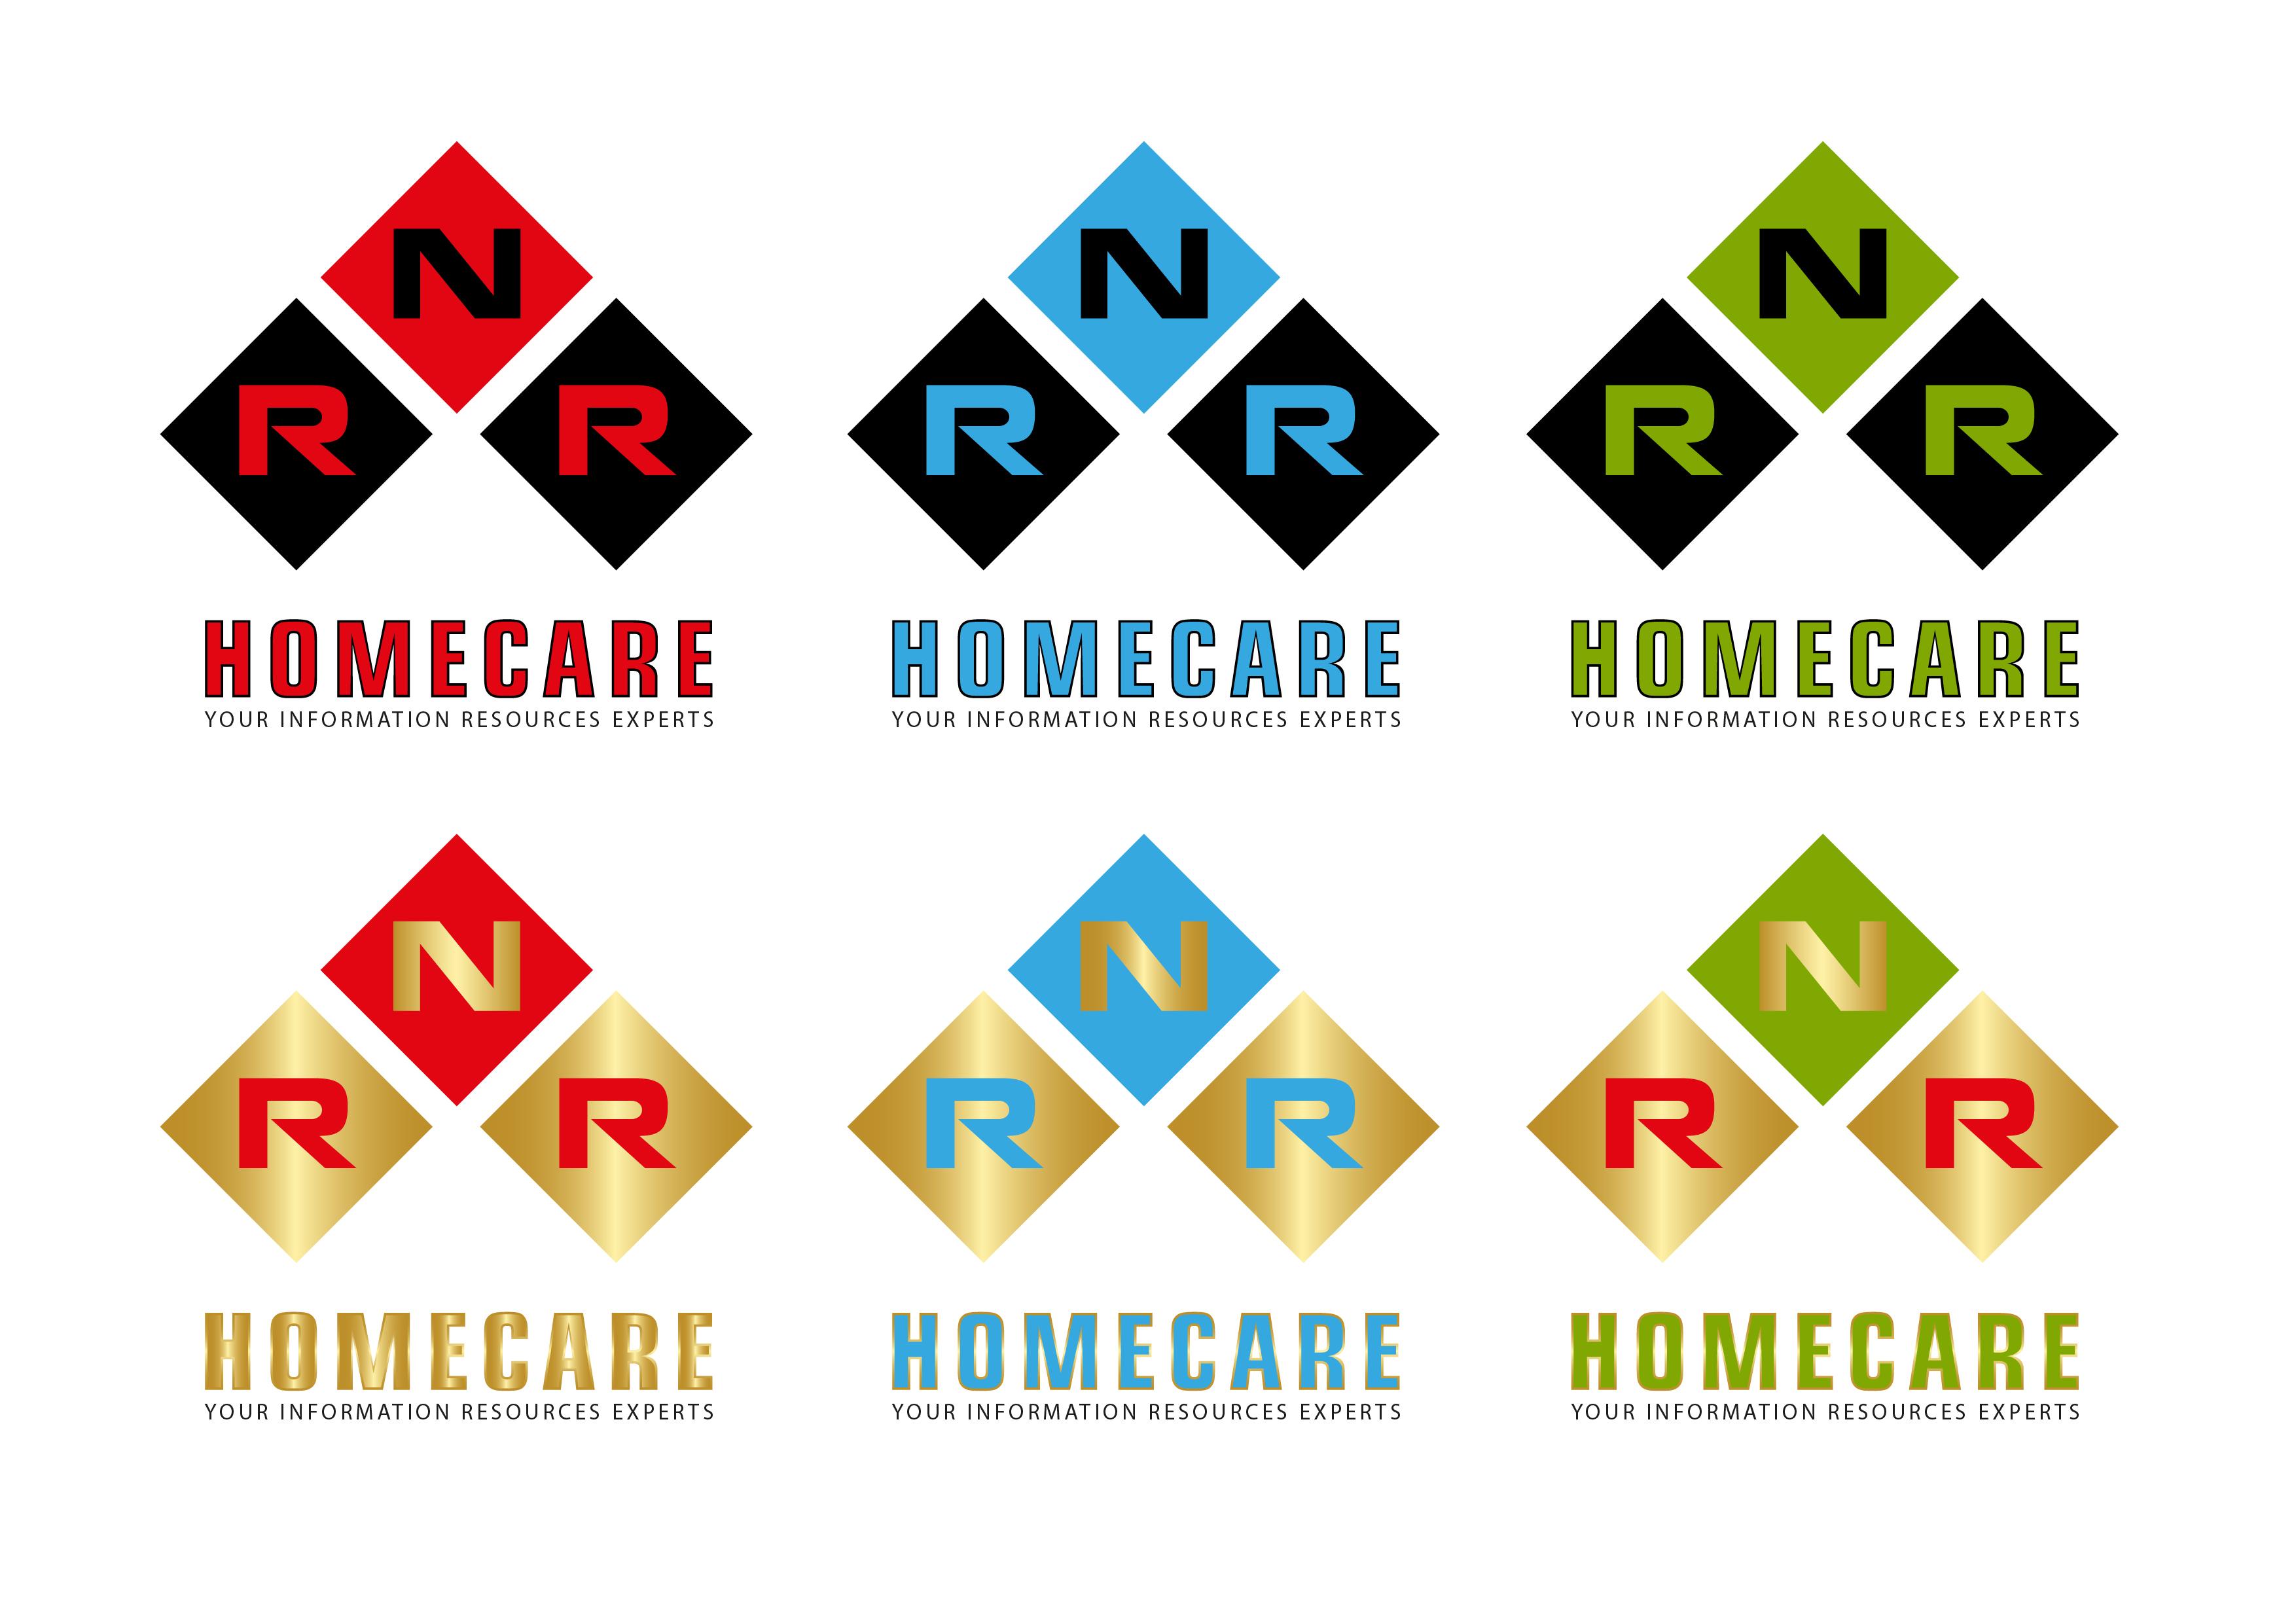 Logo Design by 3draw - Entry No. 36 in the Logo Design Contest Imaginative Logo Design for RNR HomeCare.